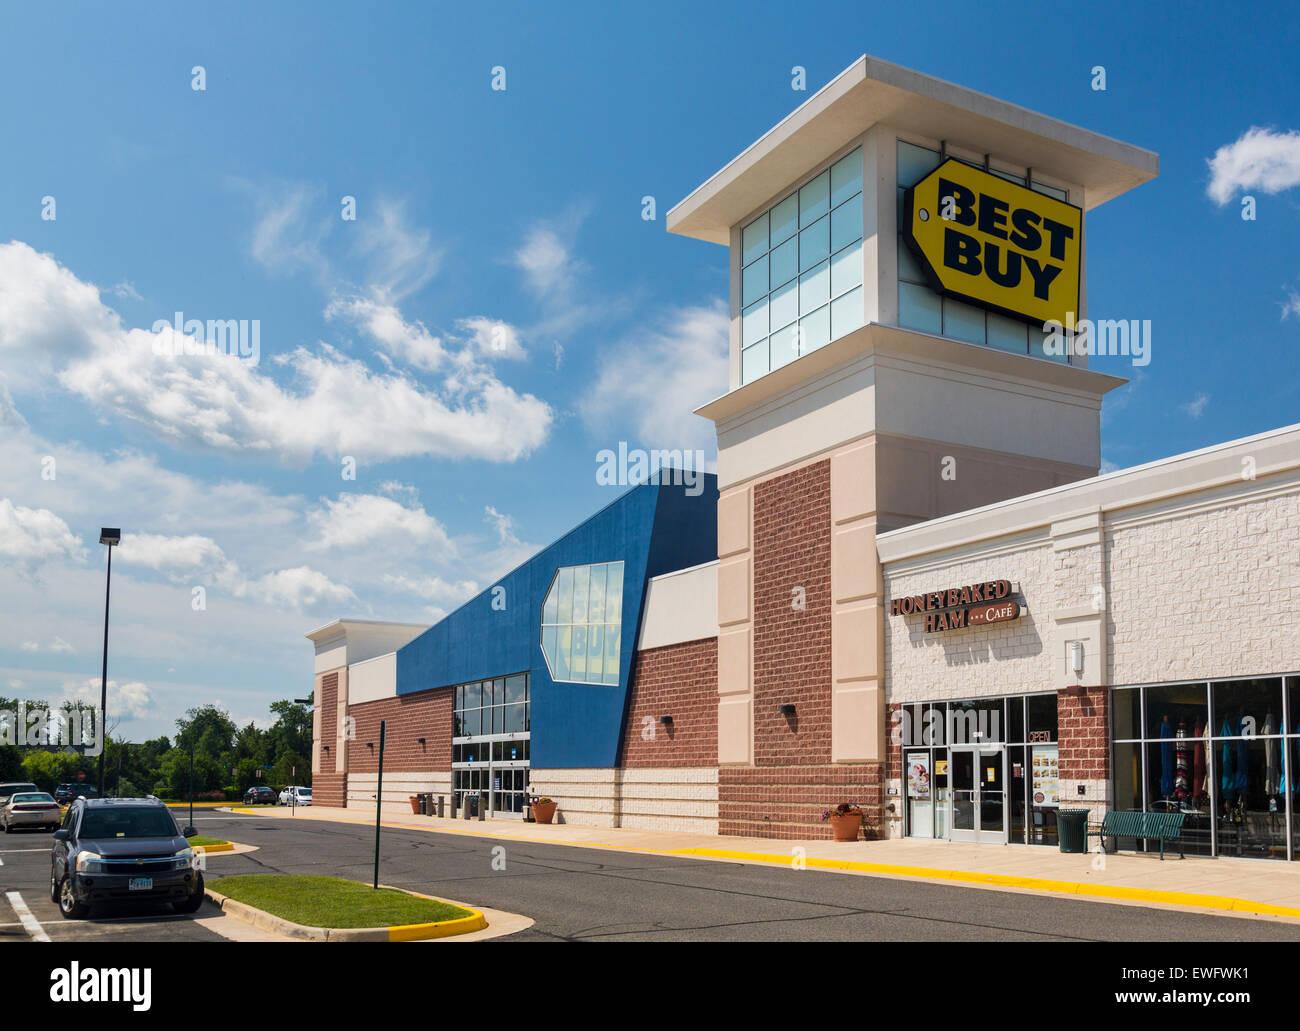 Eingang zum großen Best Buy Elektrofachmarkt in Gainesville, Virginia, USA Stockbild